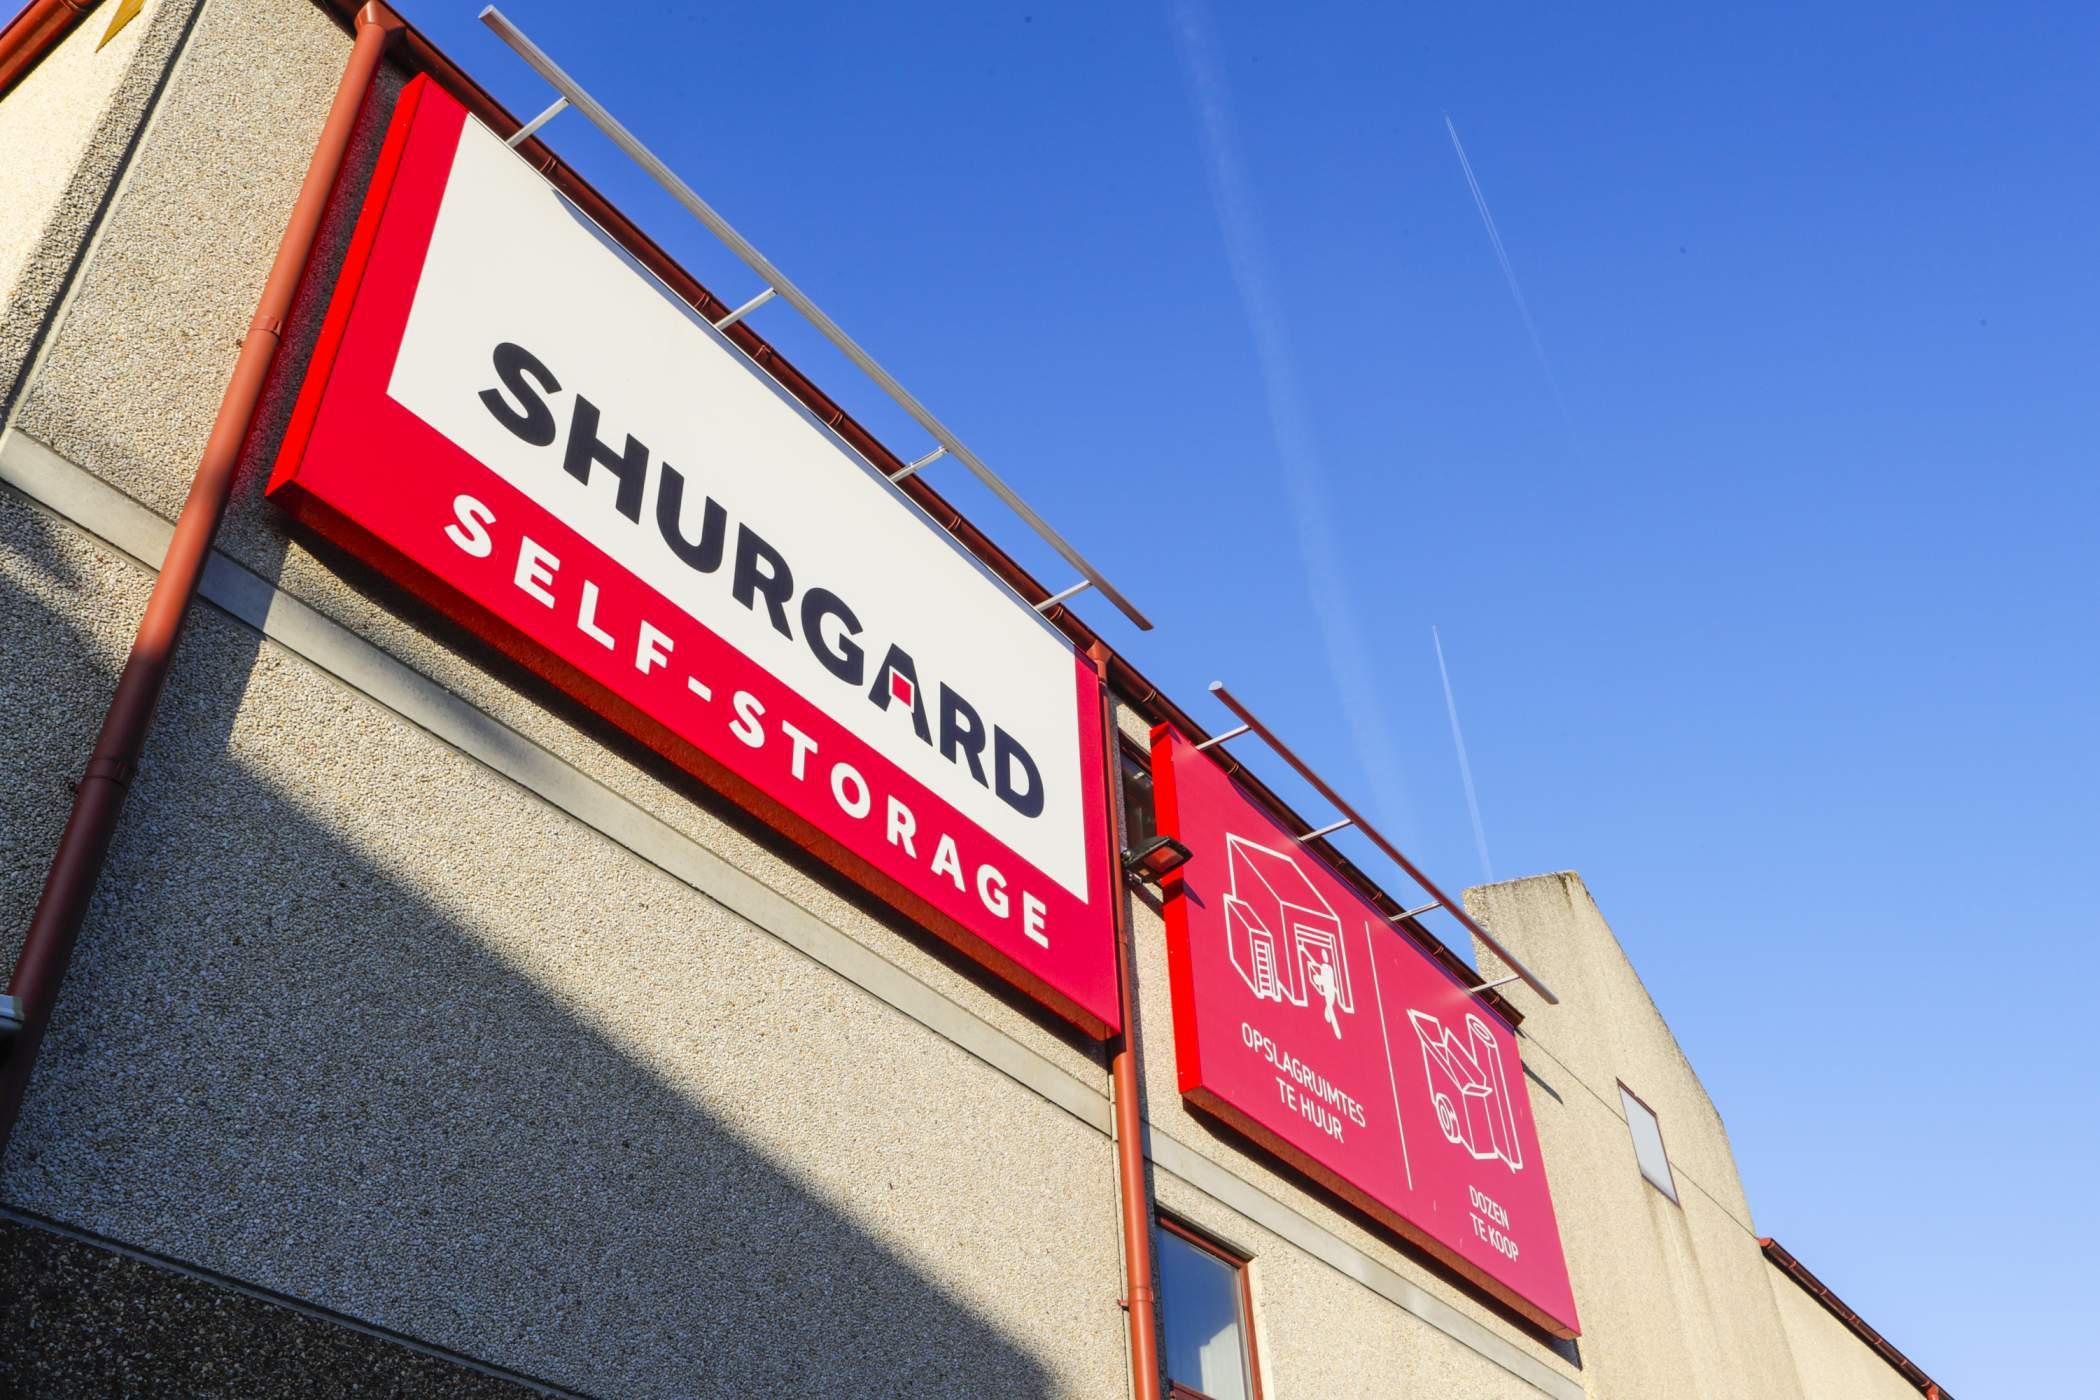 Shurgard Self-Storage Kortrijk